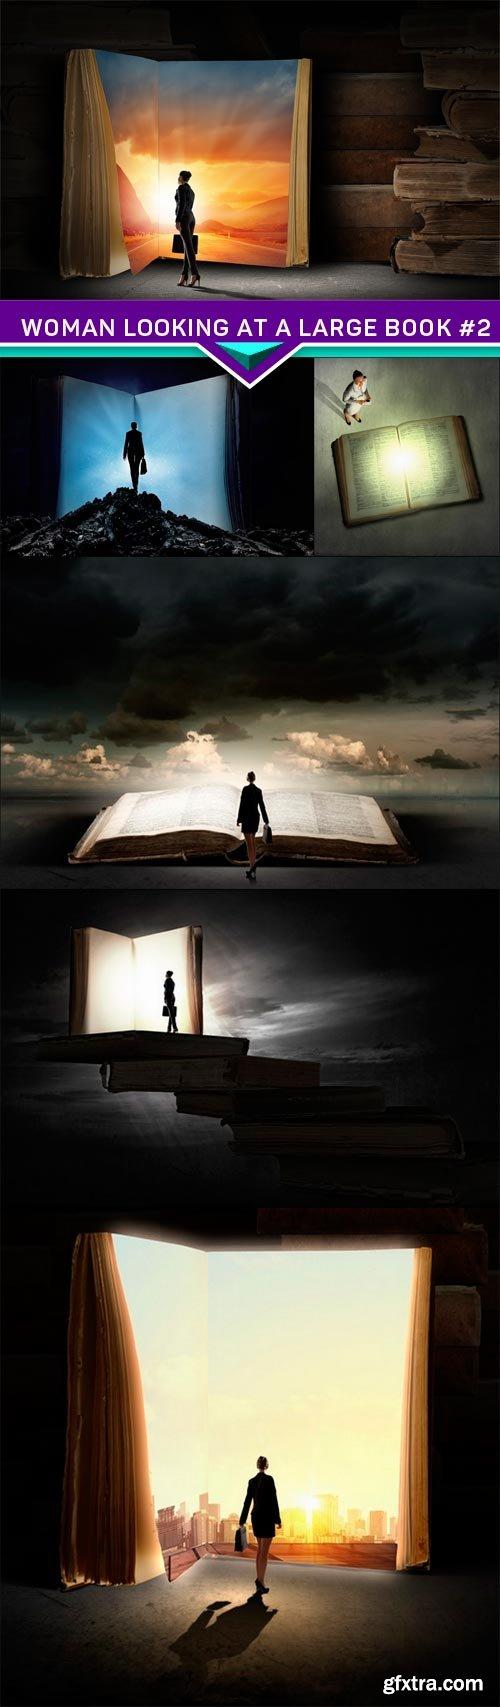 Woman looking at a large book #2 6X JPEG